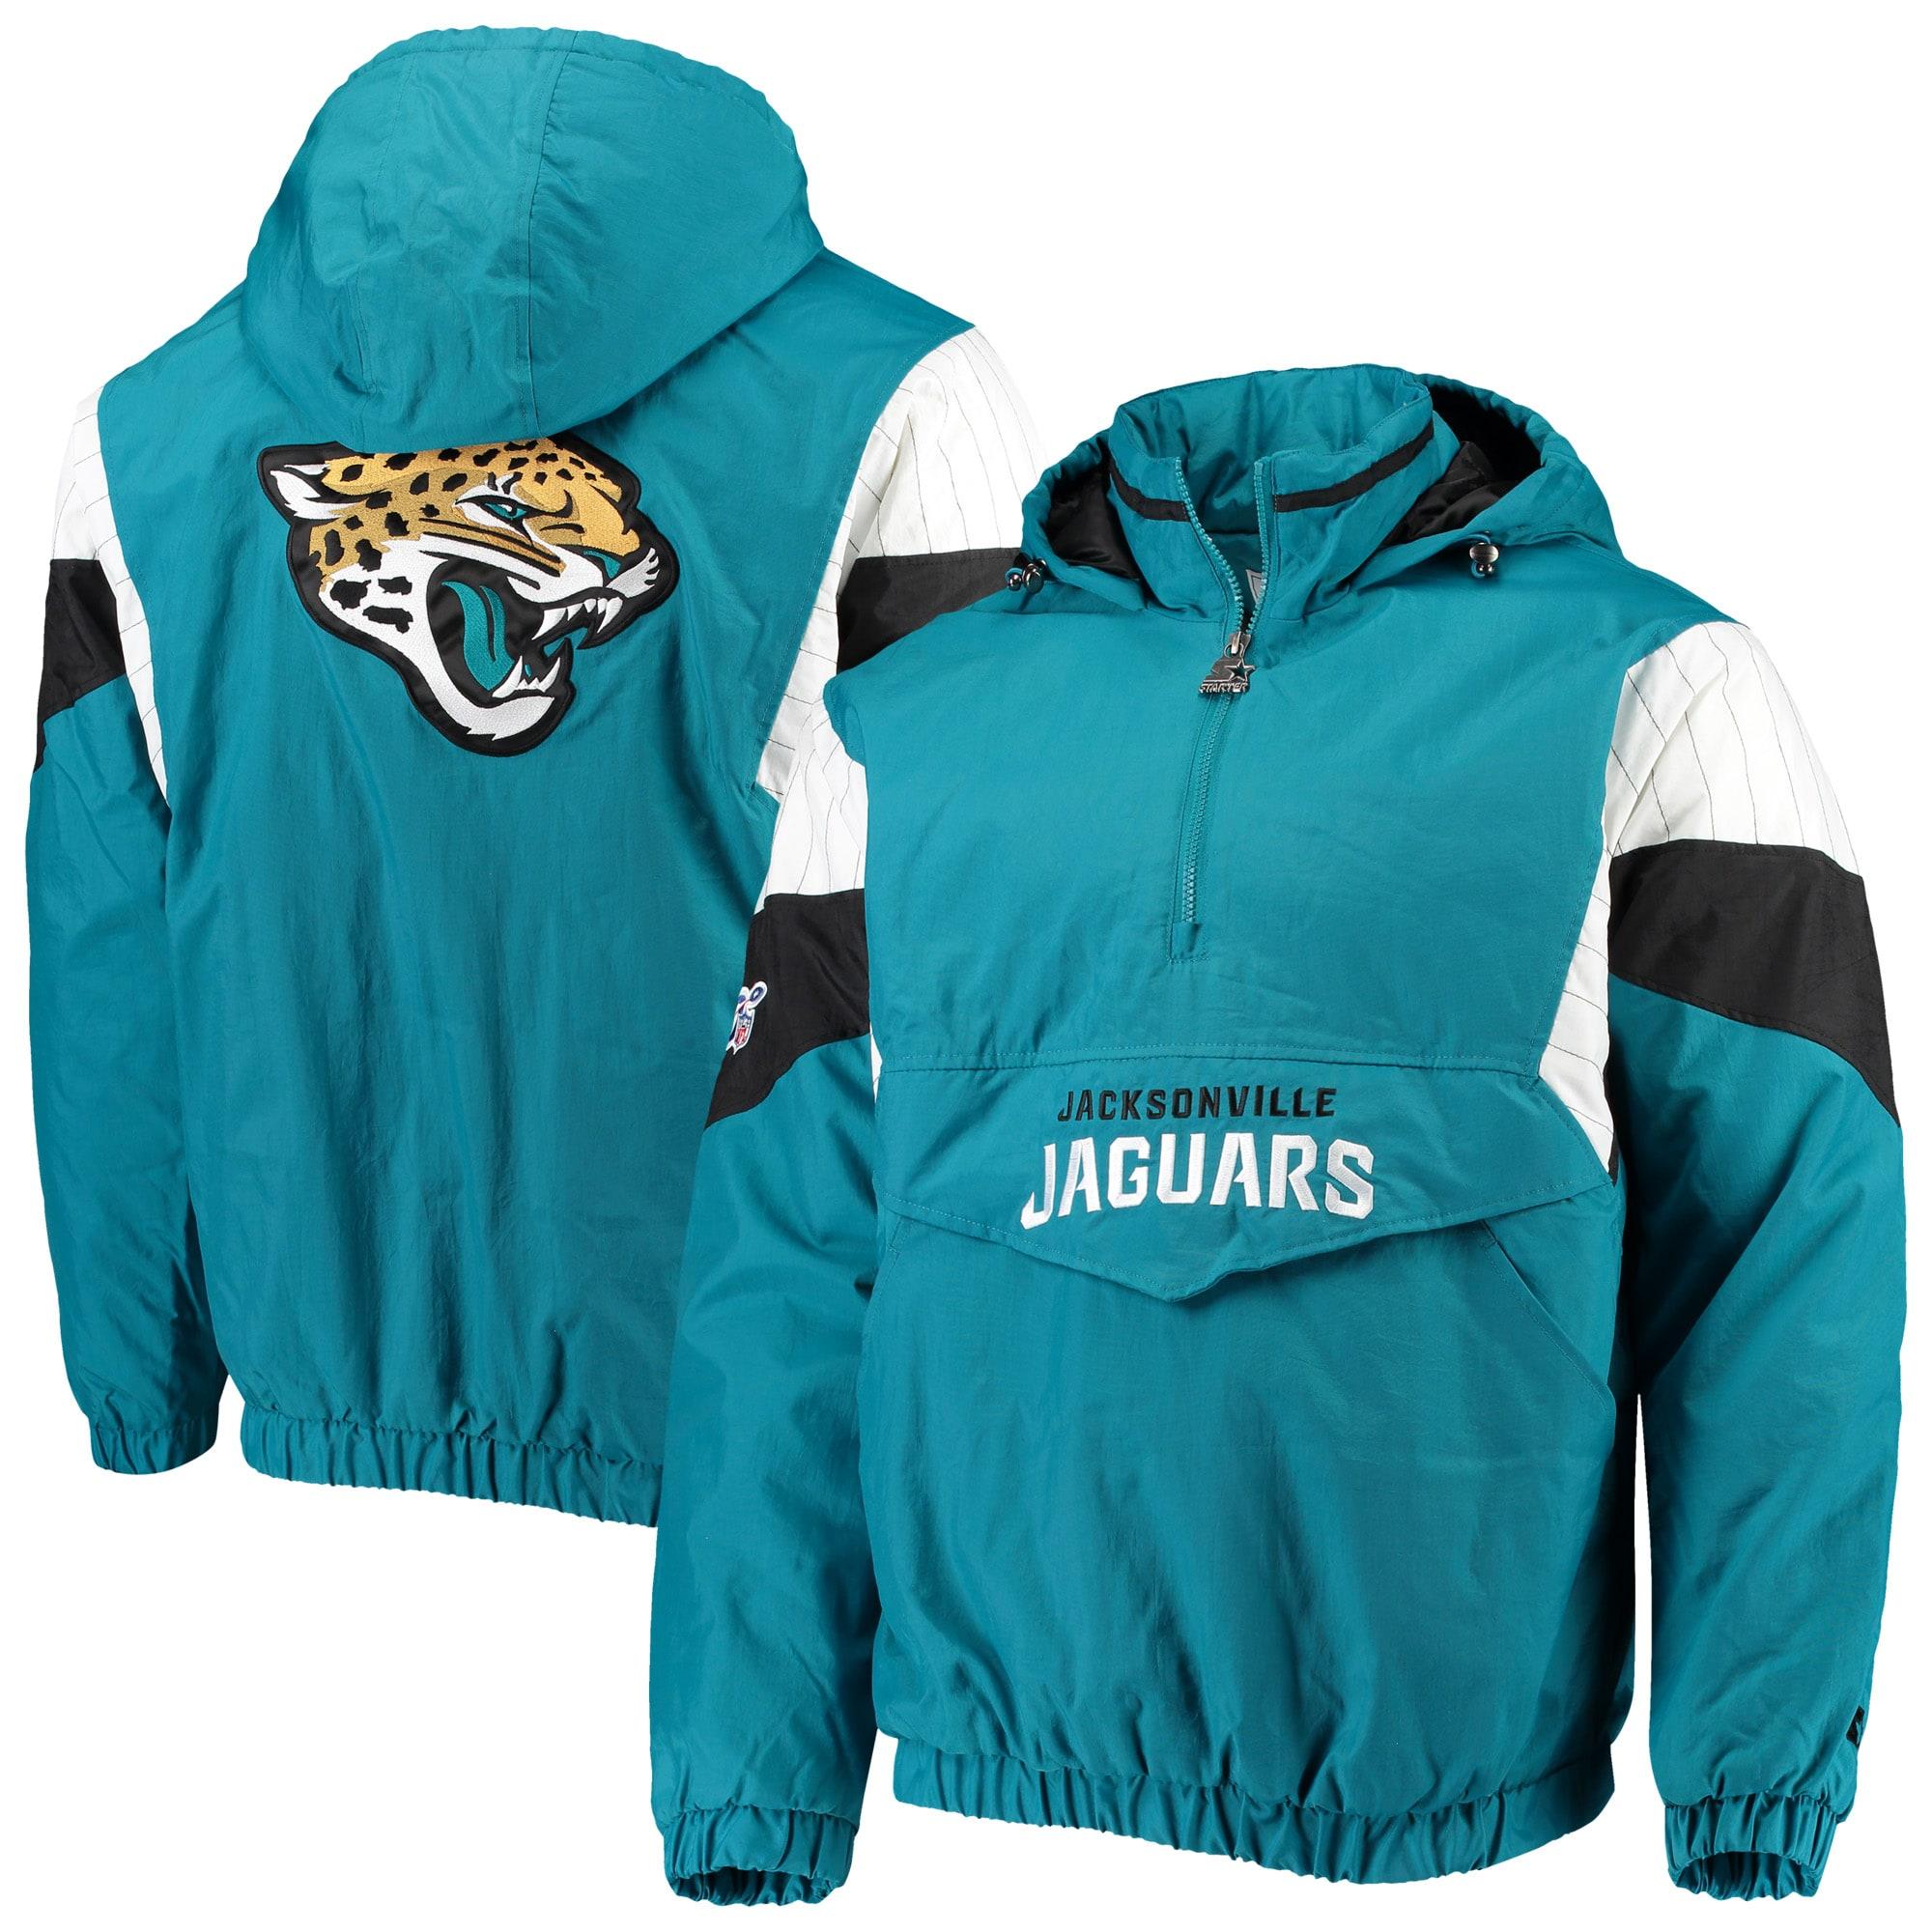 Jacksonville Jaguars Starter NFL 100 Thursday Night Lights Quarter-Zip Breakaway Jacket - Teal/Black